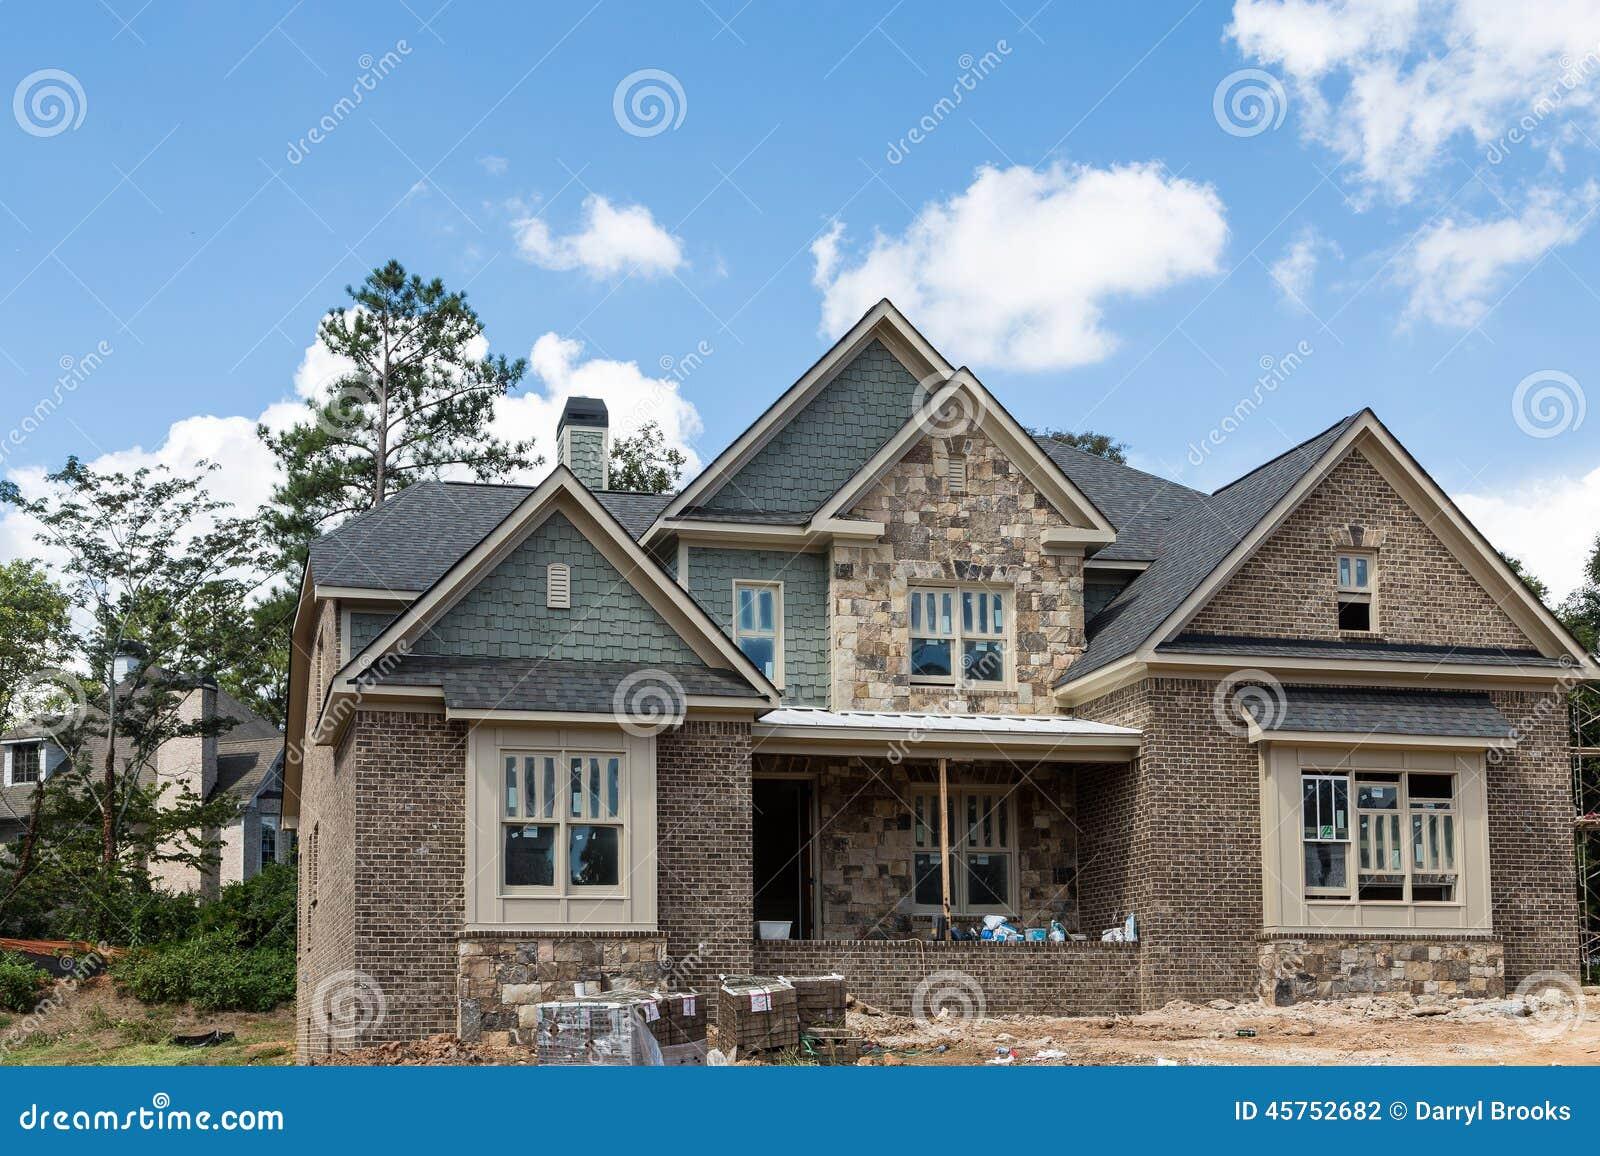 Construire maison en pierre latest construire maison en - Construire maison en pierre ...